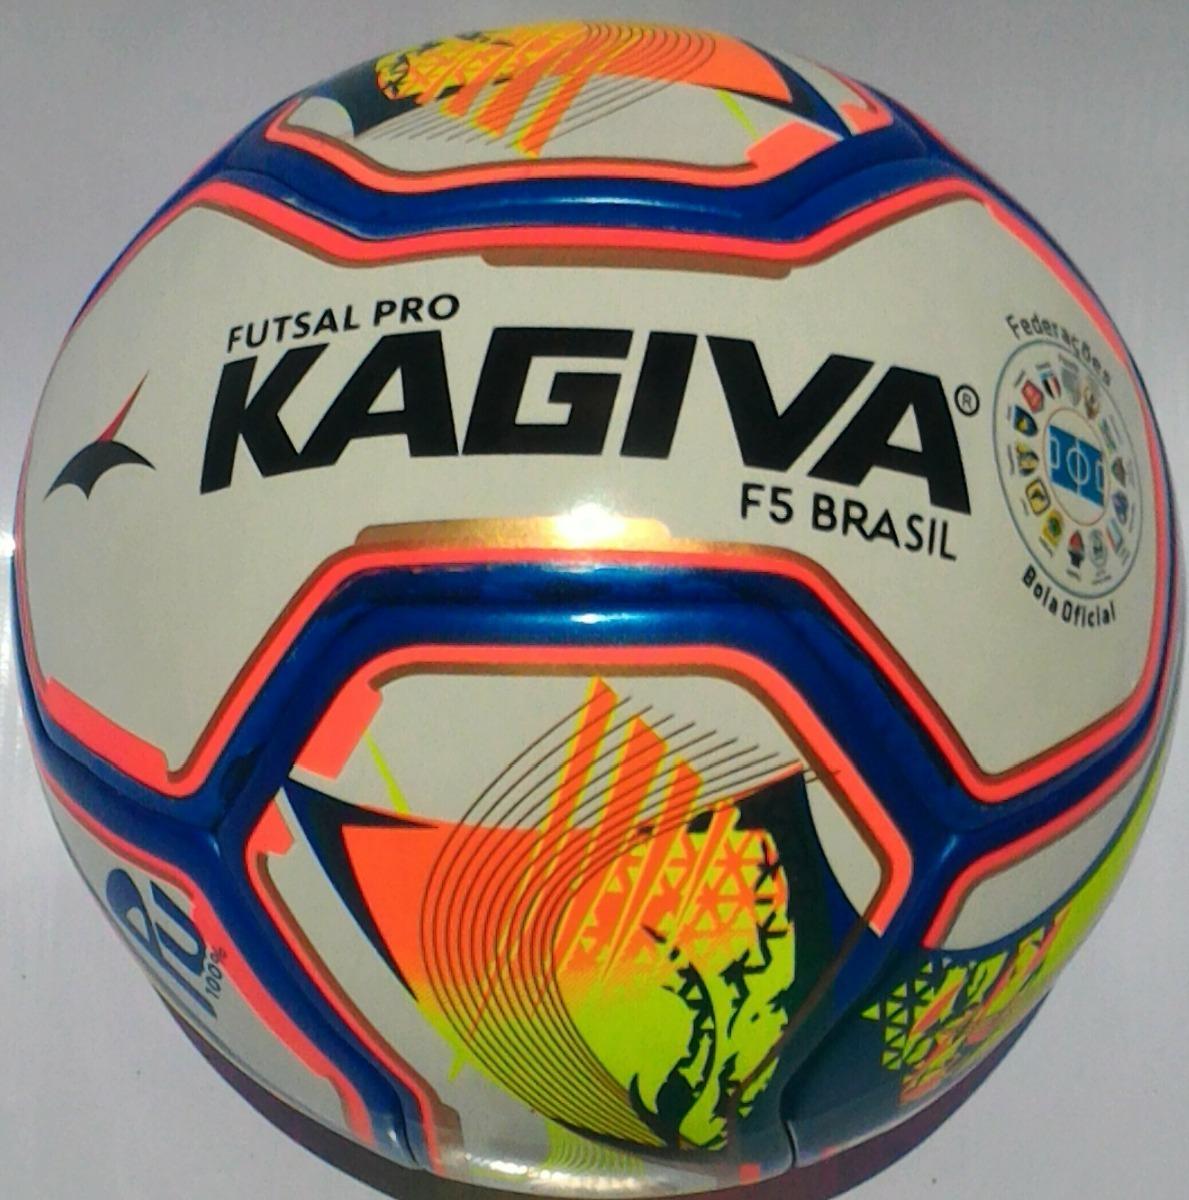 cefb5920d7f85 2 Bolas Futsal Kagiva F5 Brasil Pro Oficial Melhor Preço - R  235